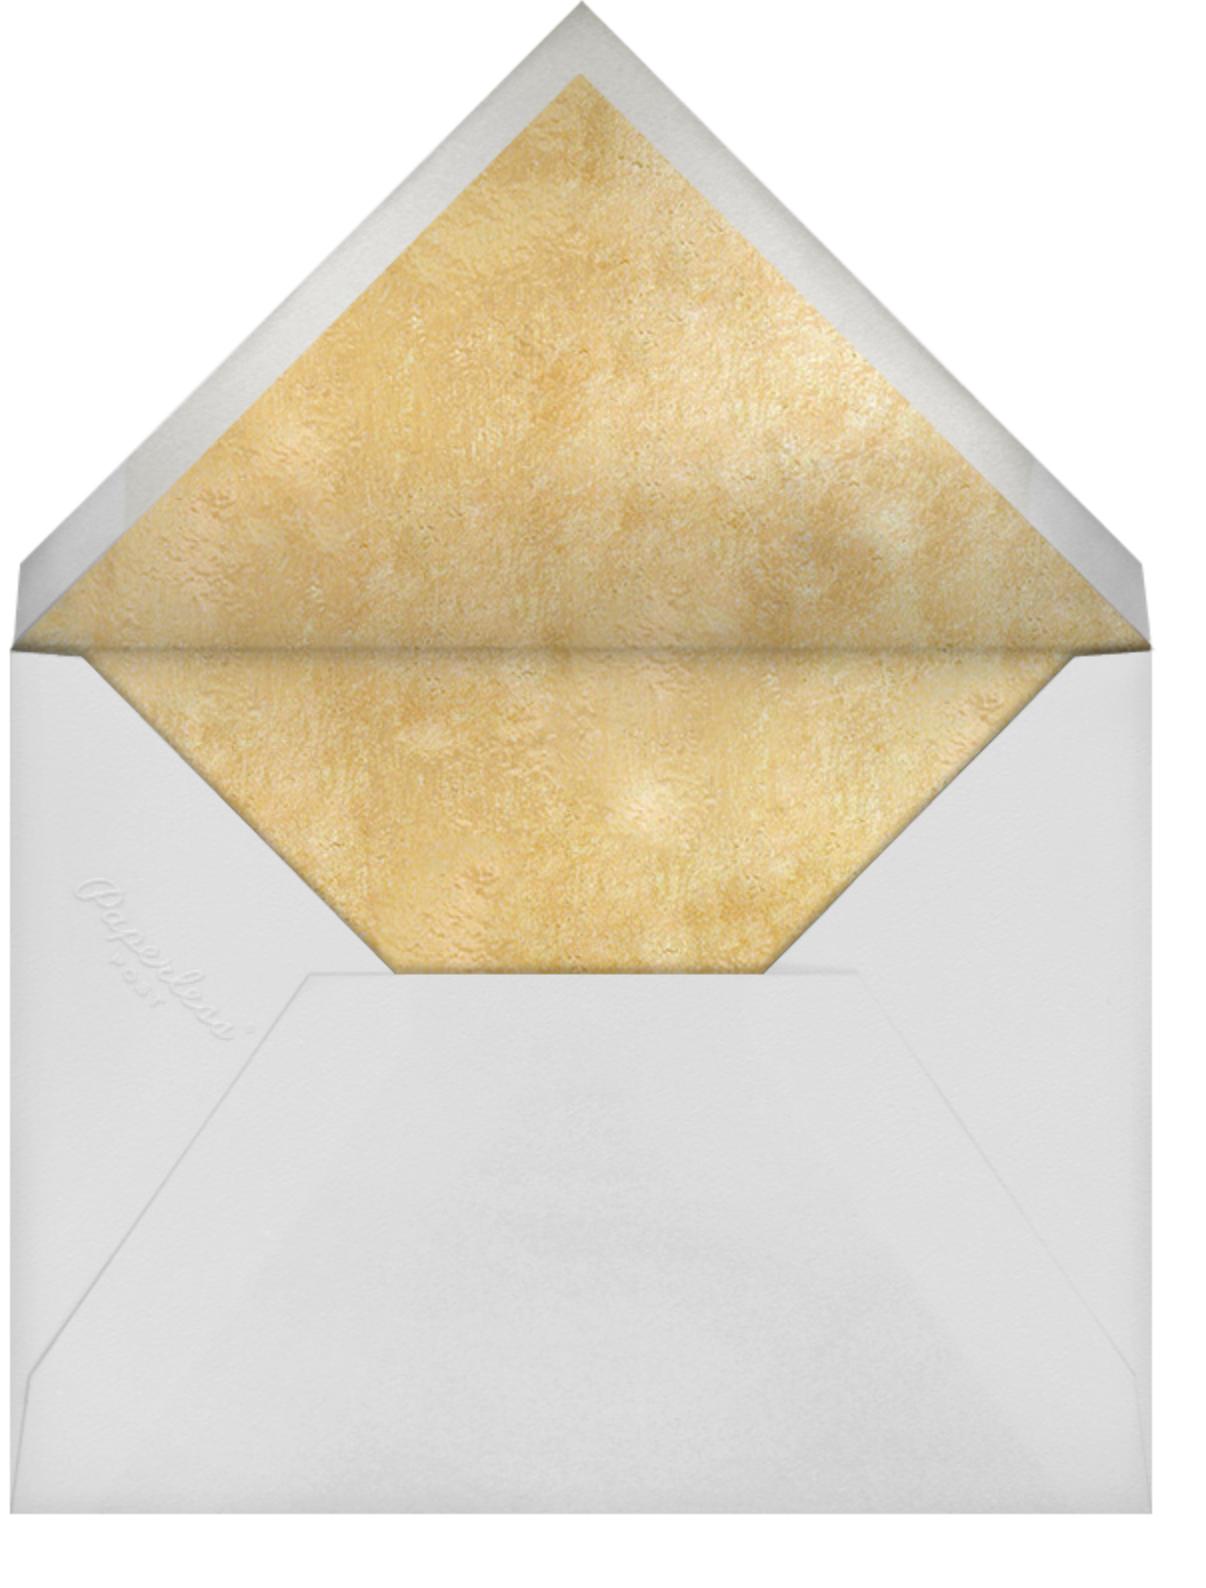 Lanai Floral (Invitation) - kate spade new york - All - envelope back